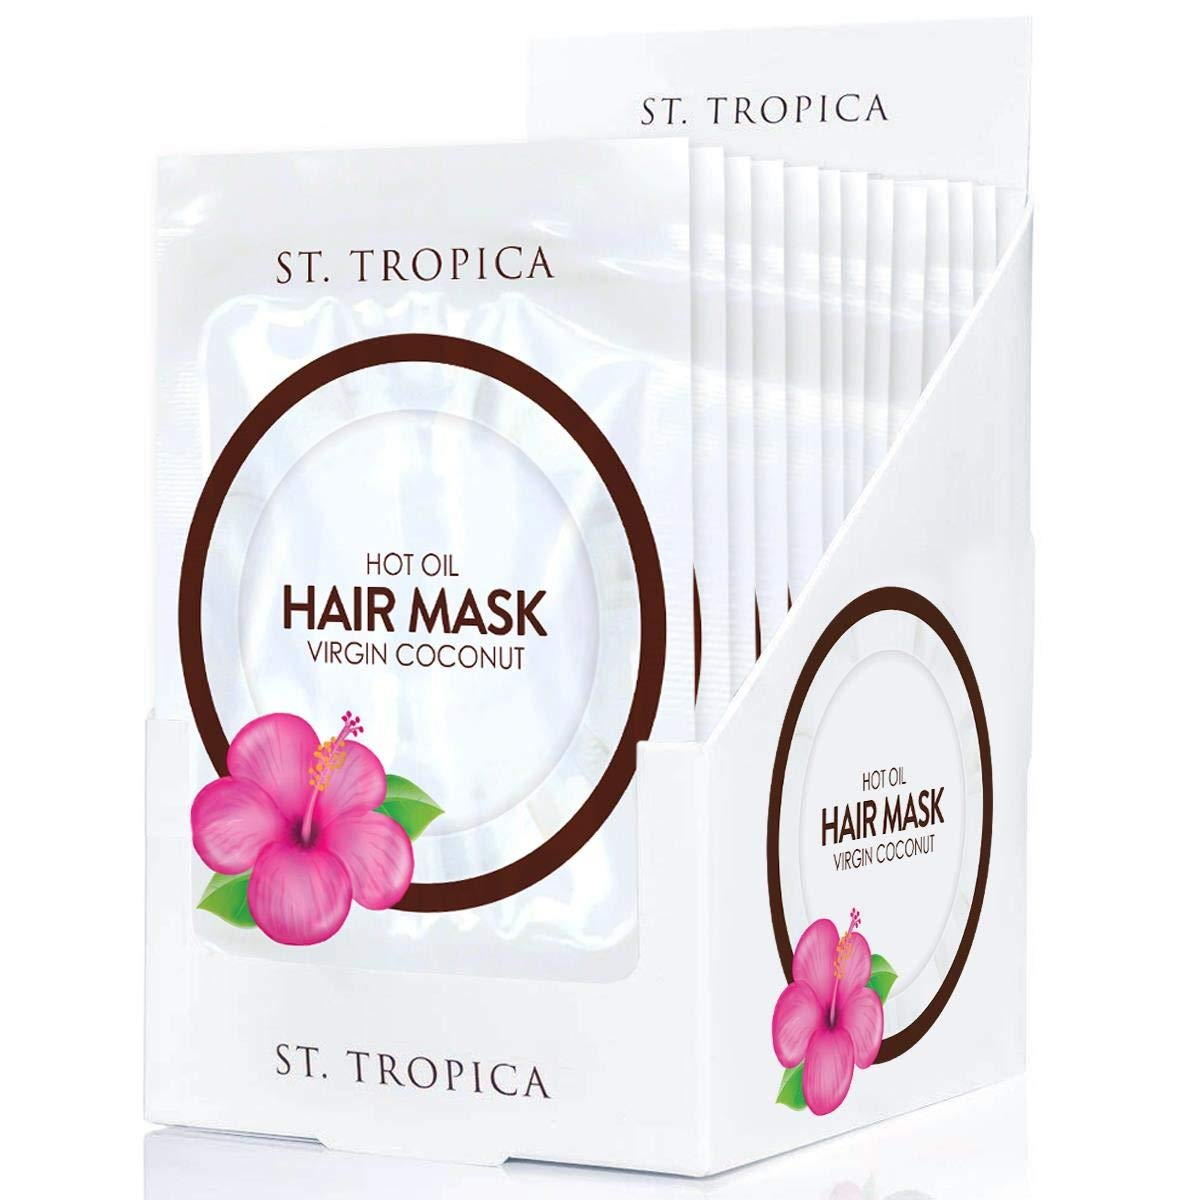 ST. TROPICA Coconut Oil Hair Mask (12 Hair Masks) #1 Ranked on Skin Deep, Restorative Hair Mask, Deep Conditioner Repair for Dry, Damaged Hair, Natural Hair Care Treatment + Deep Shine